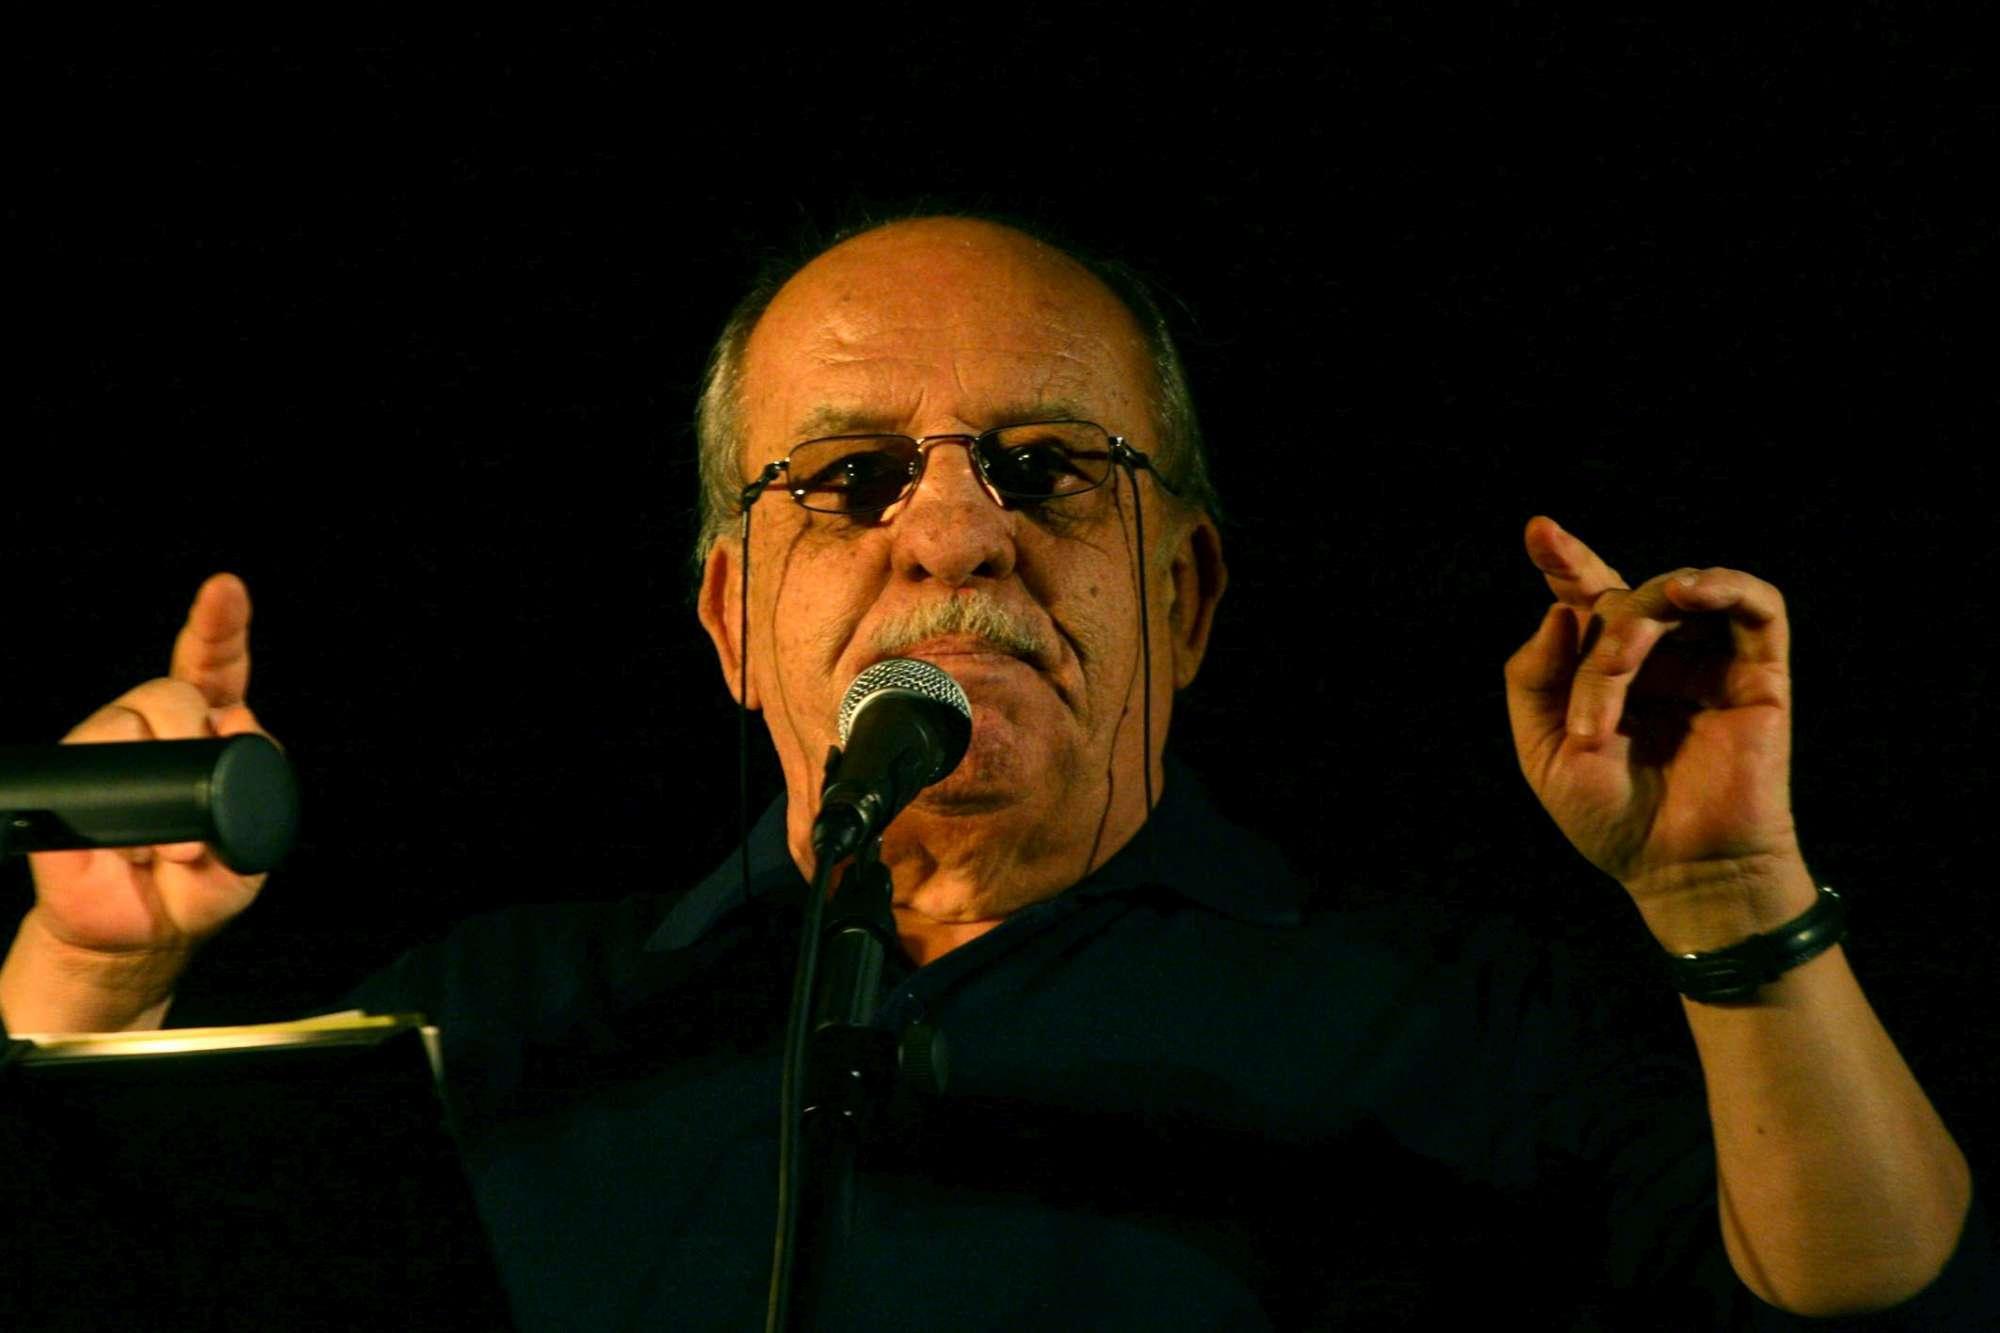 Nanni Svampa, addio al grande musicista, tra cabaret e canzone folk